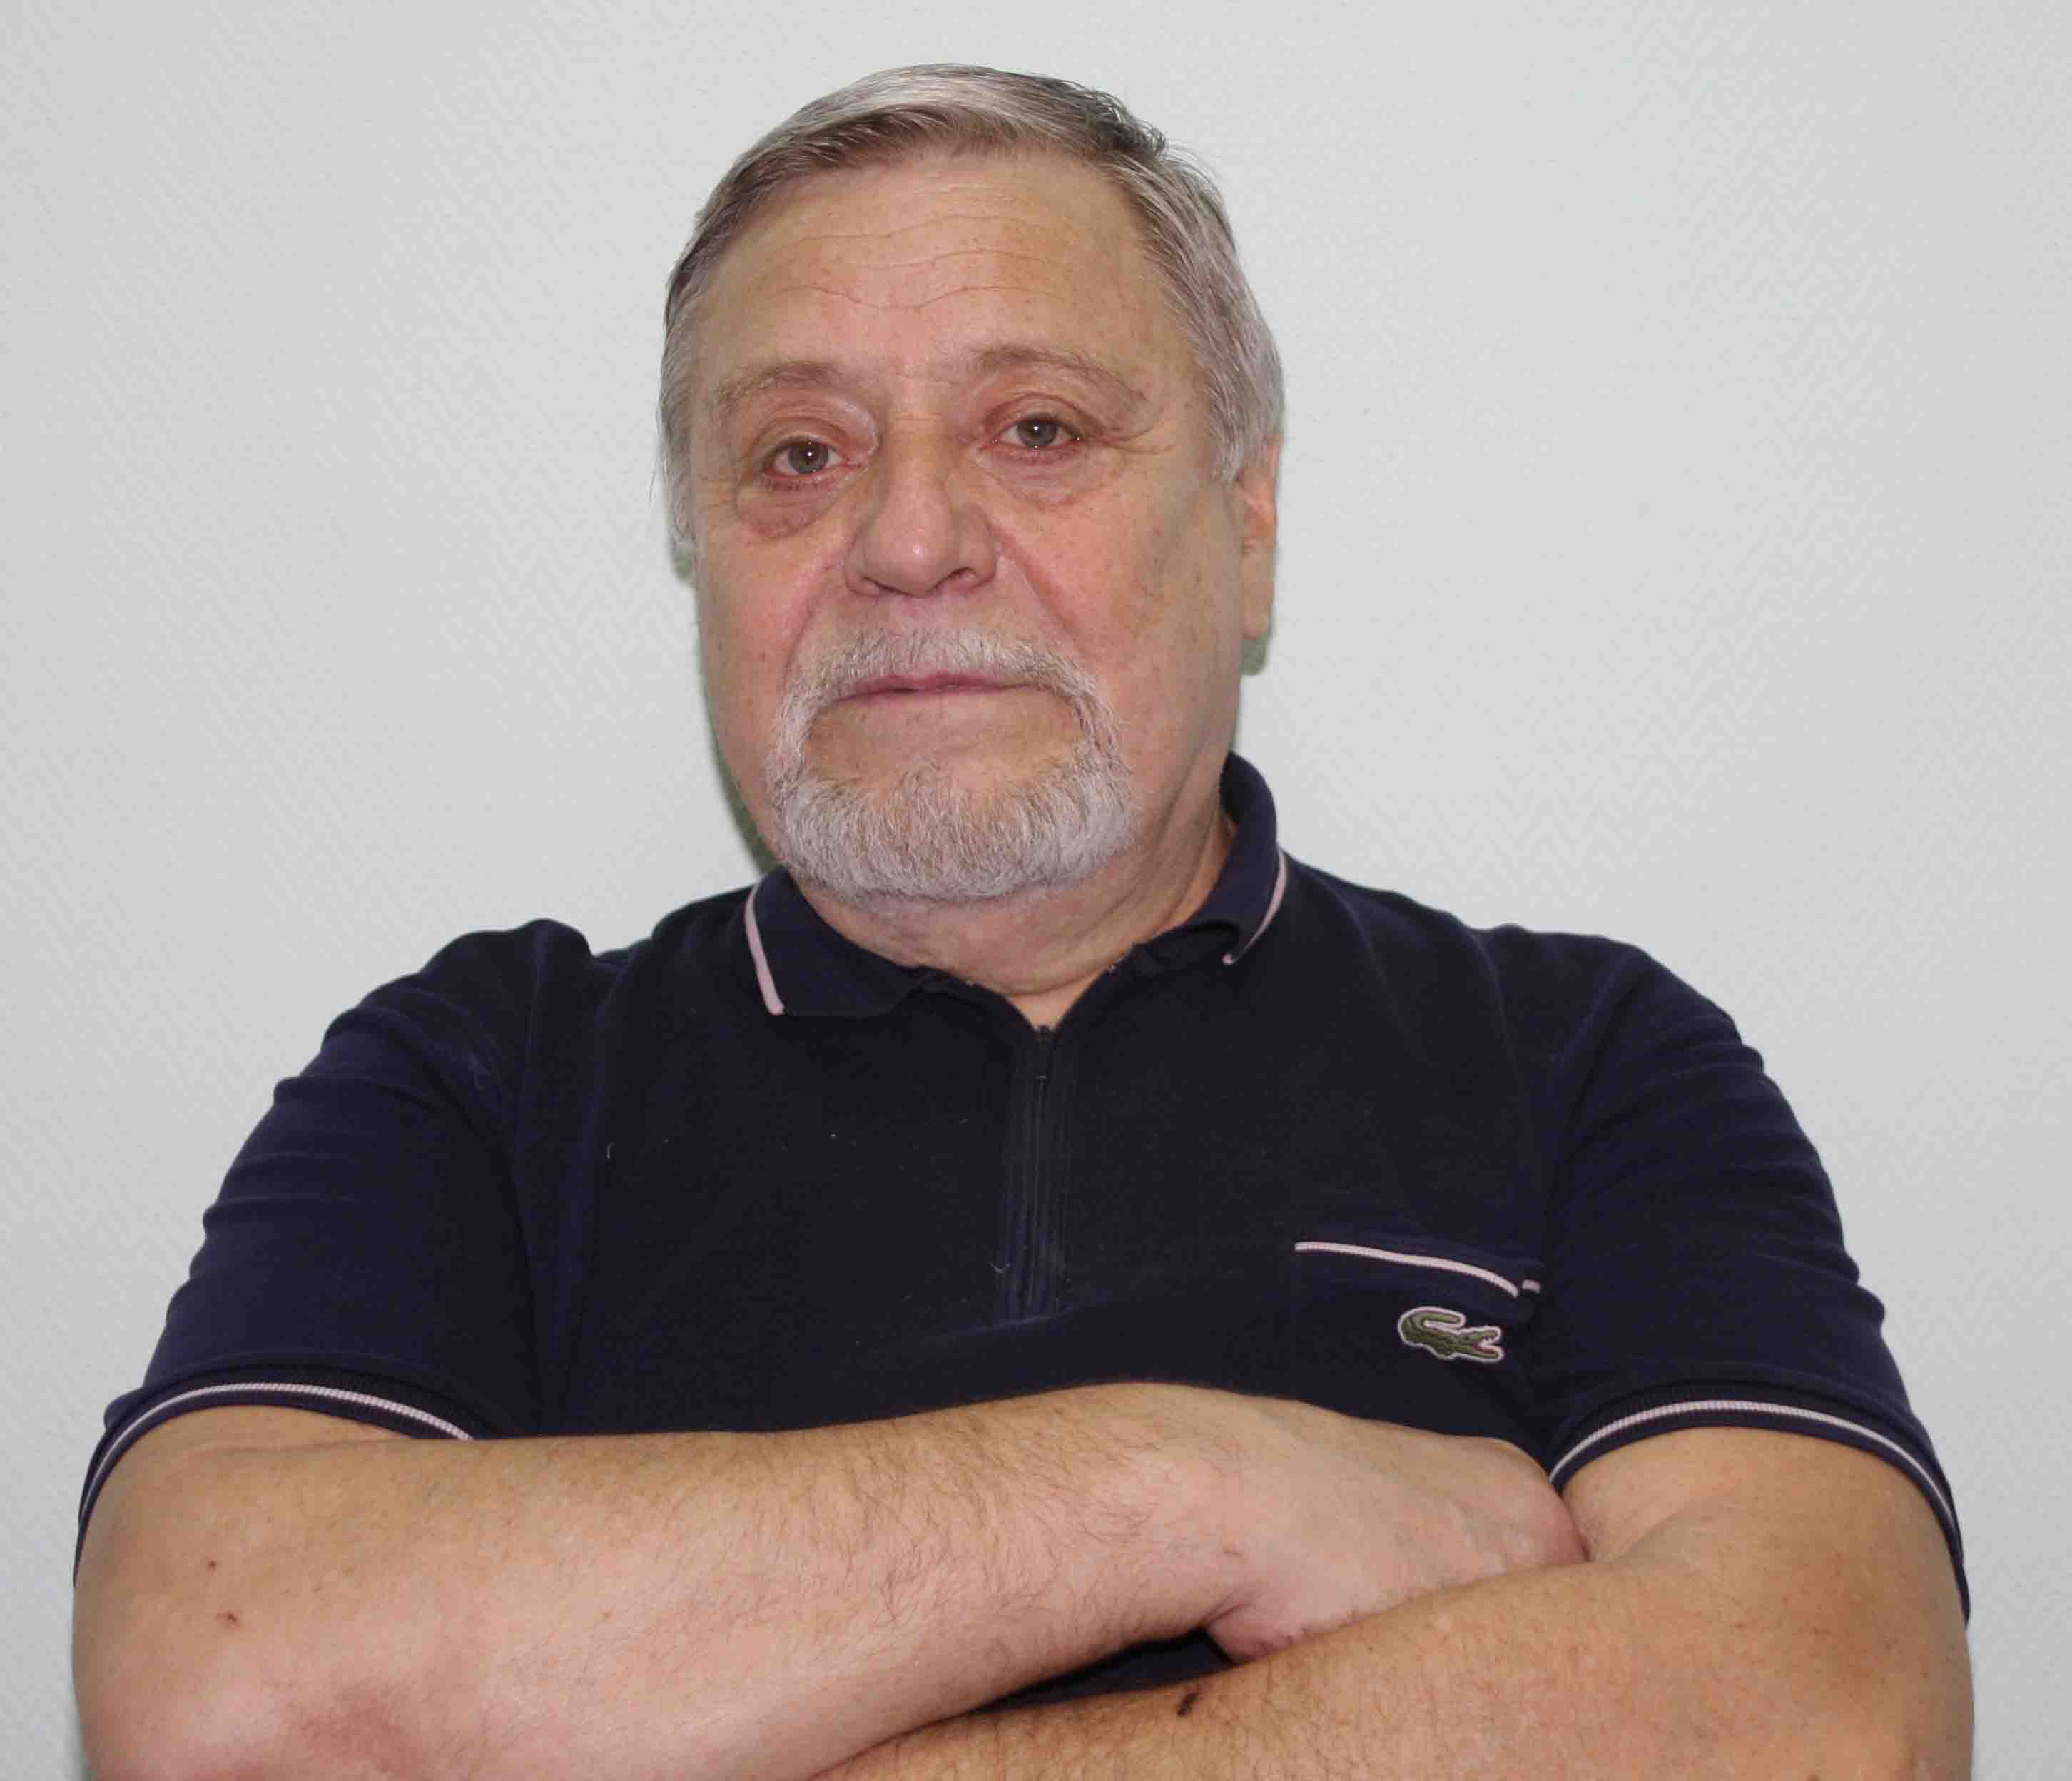 Дьяченко олег брониславович дети фото